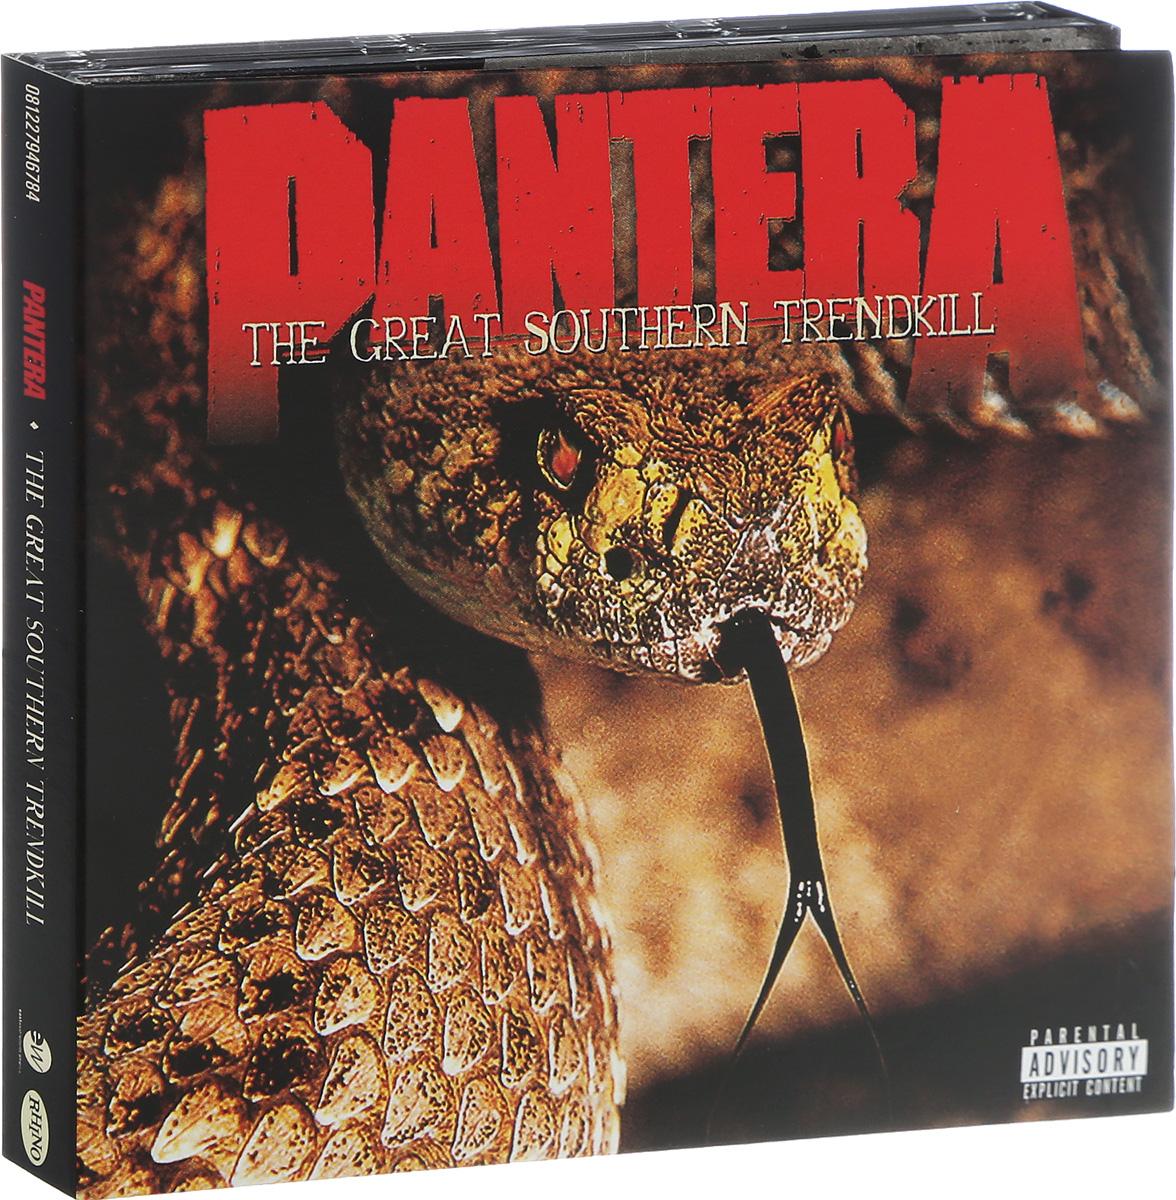 Pantera Pantera. The Great Southern Trendkill (2 CD) pantera pantera the great southern trendkill 2 lp 180 gr